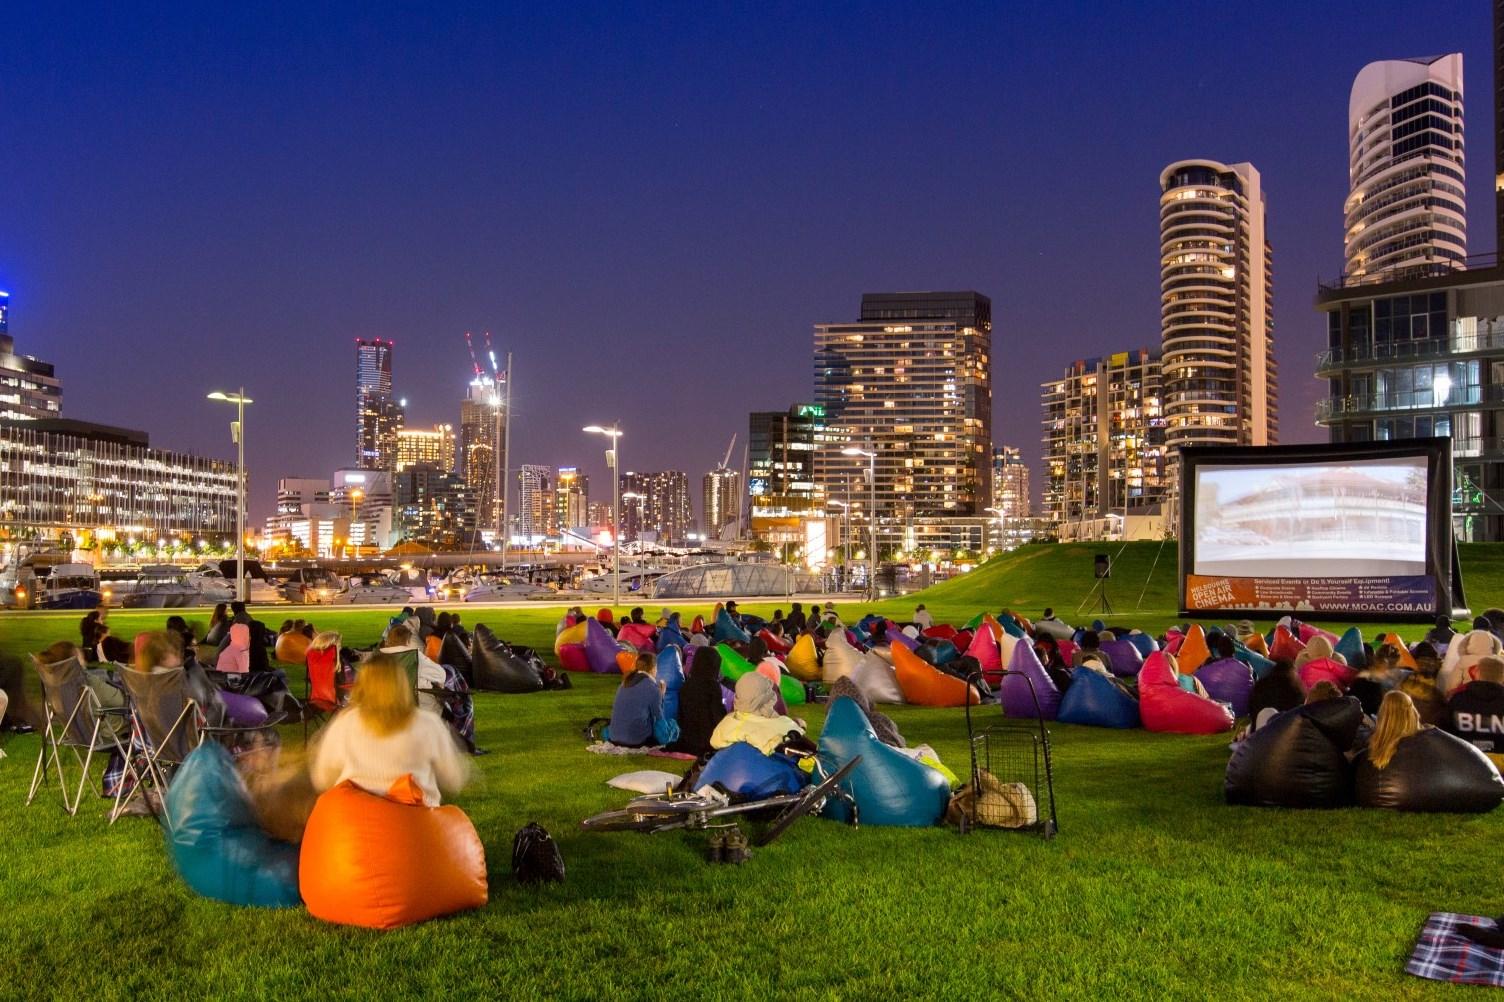 "Buluk Park in Docklands for a free Friday night film - 8 trải nghiệm ""nóng bỏng"" nhất Melbourne mùa hè này"